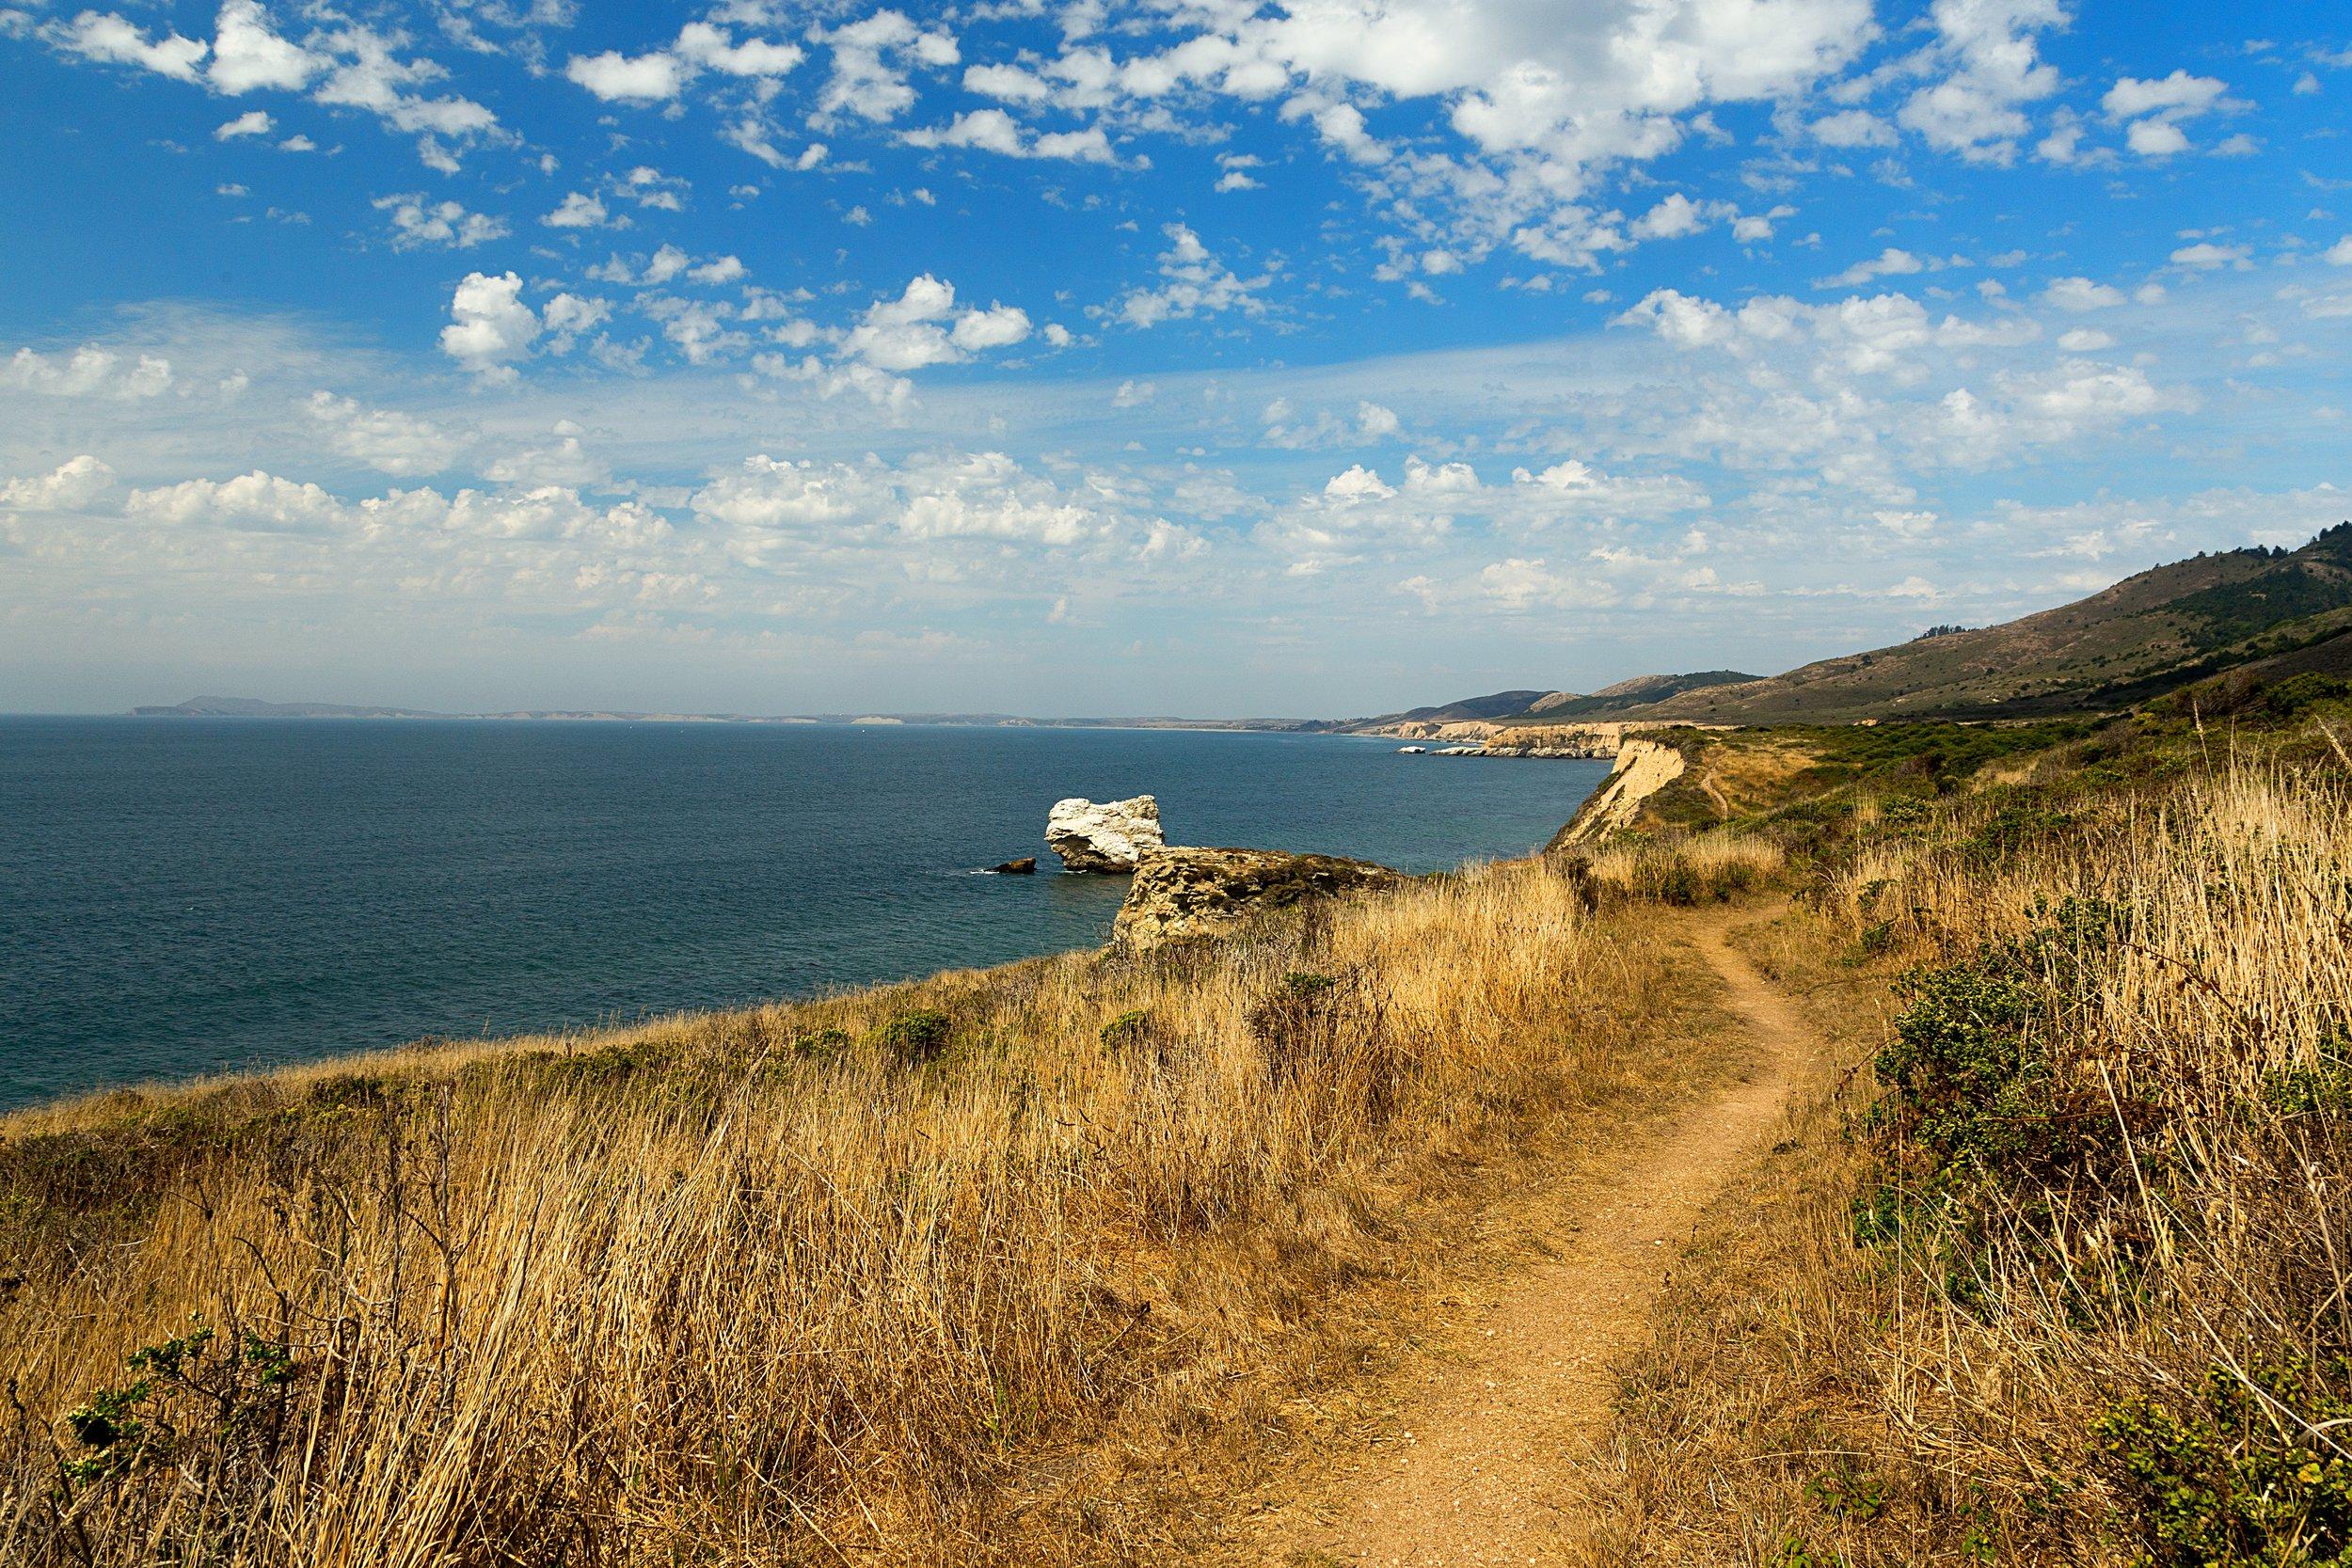 Bear Valley Trail - Point Reyes National Seashore